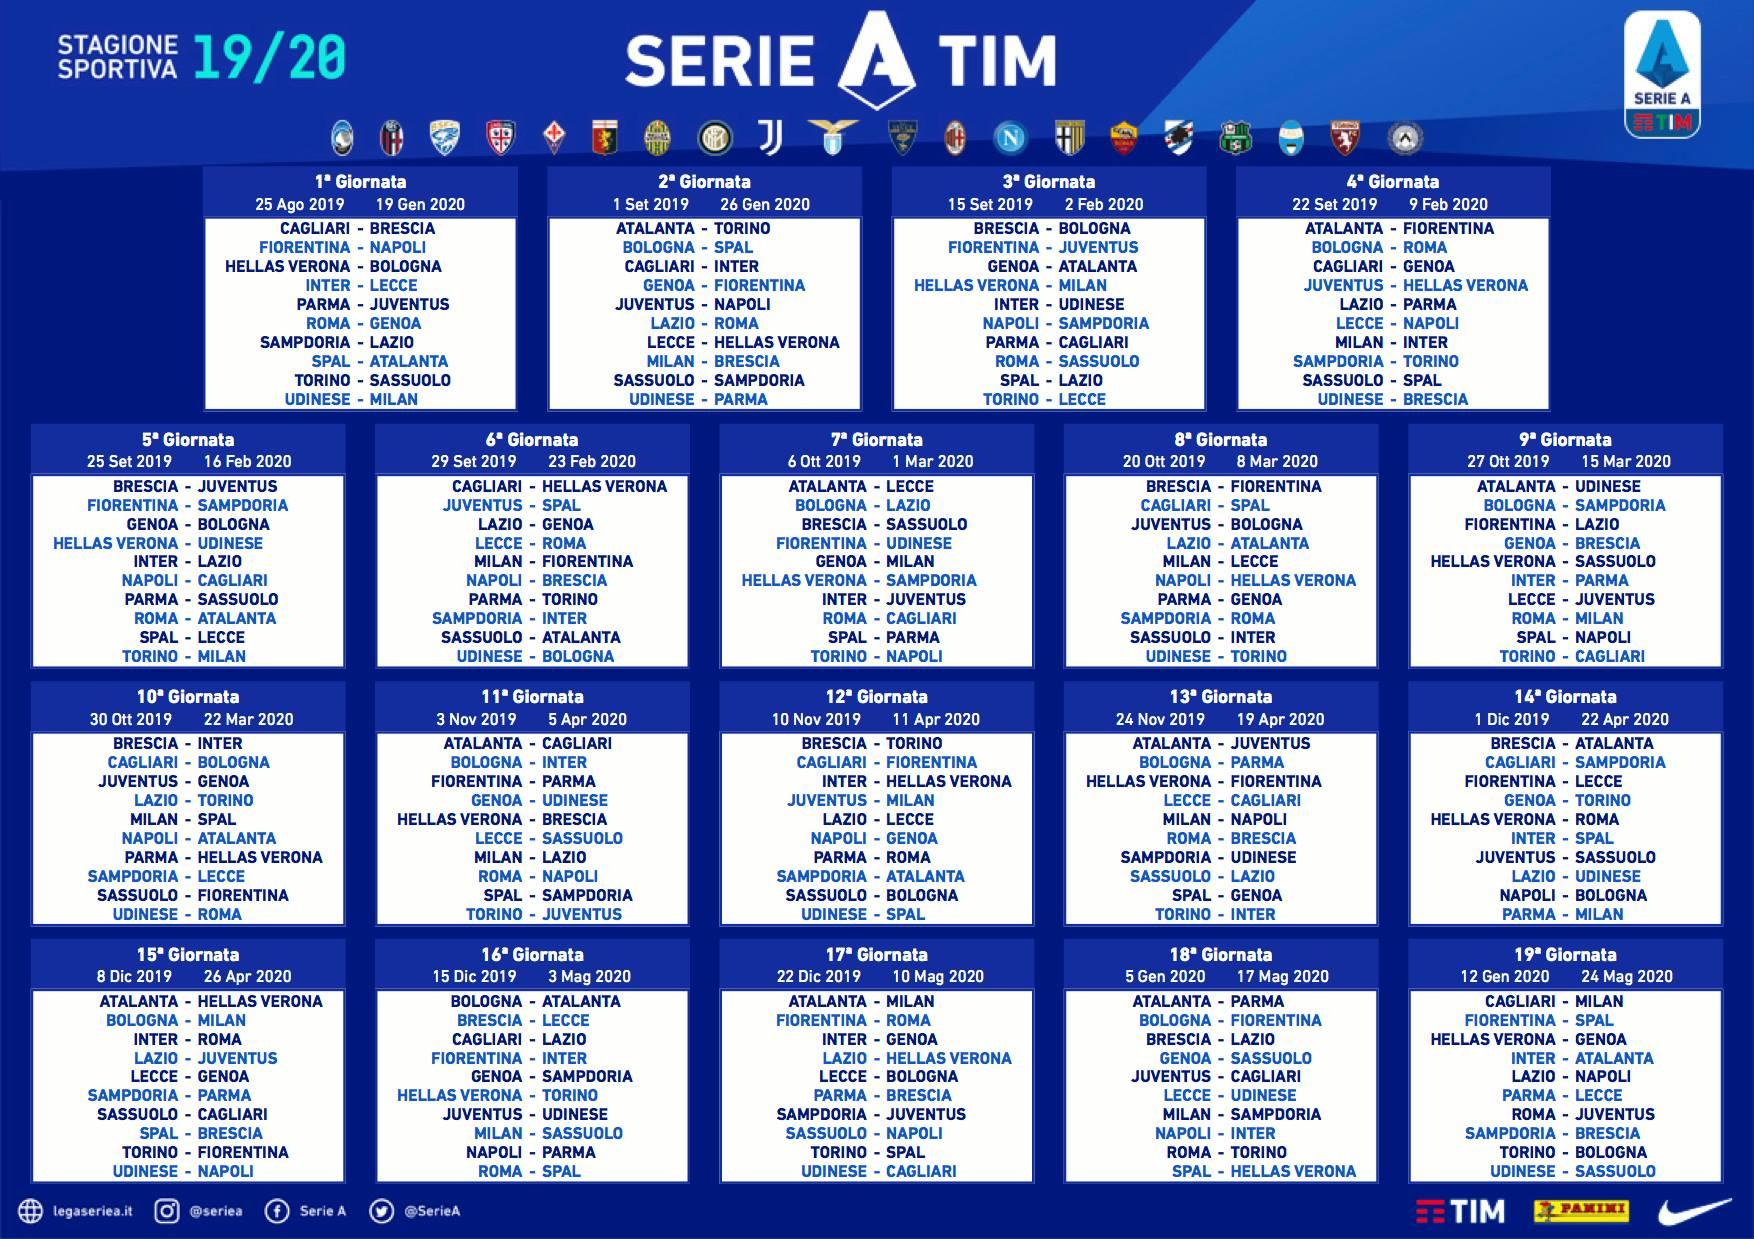 Calendario Serie A 15 Ottobre.Calendario Serie A 2019 2020 Tutte Le Partite Date Andata